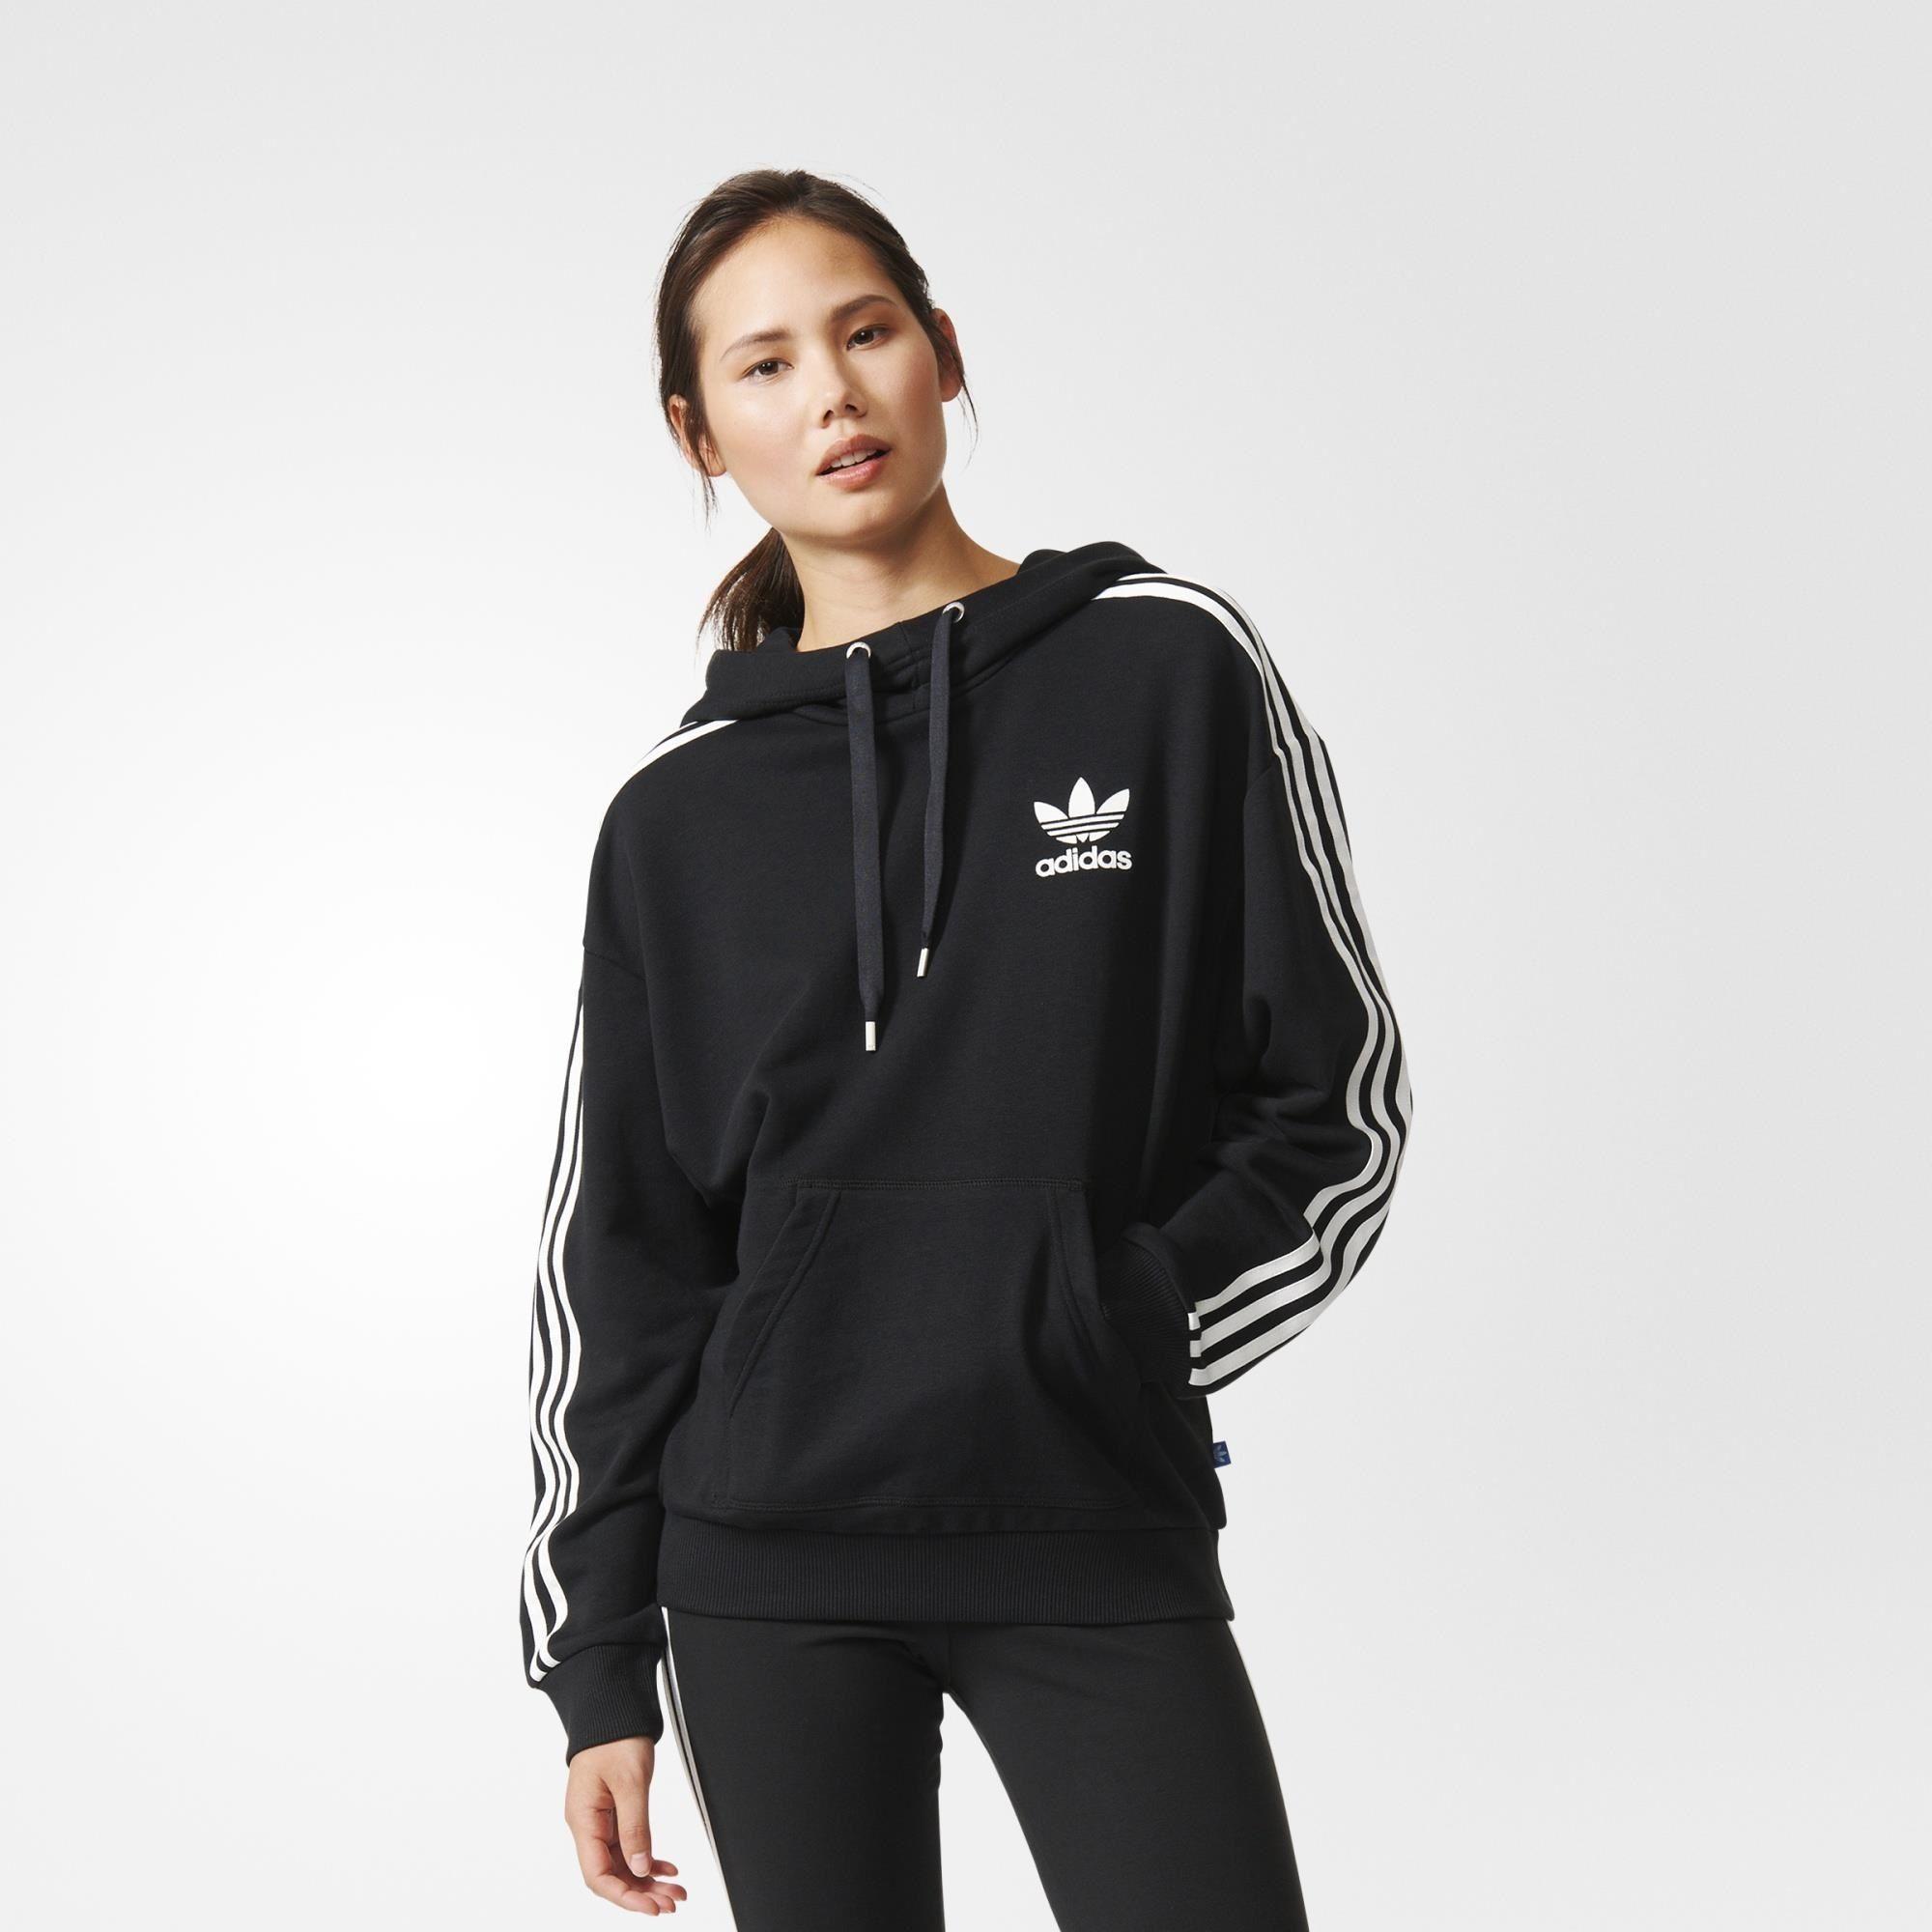 adidas 3-Stripes Hoodie - Black | adidas US